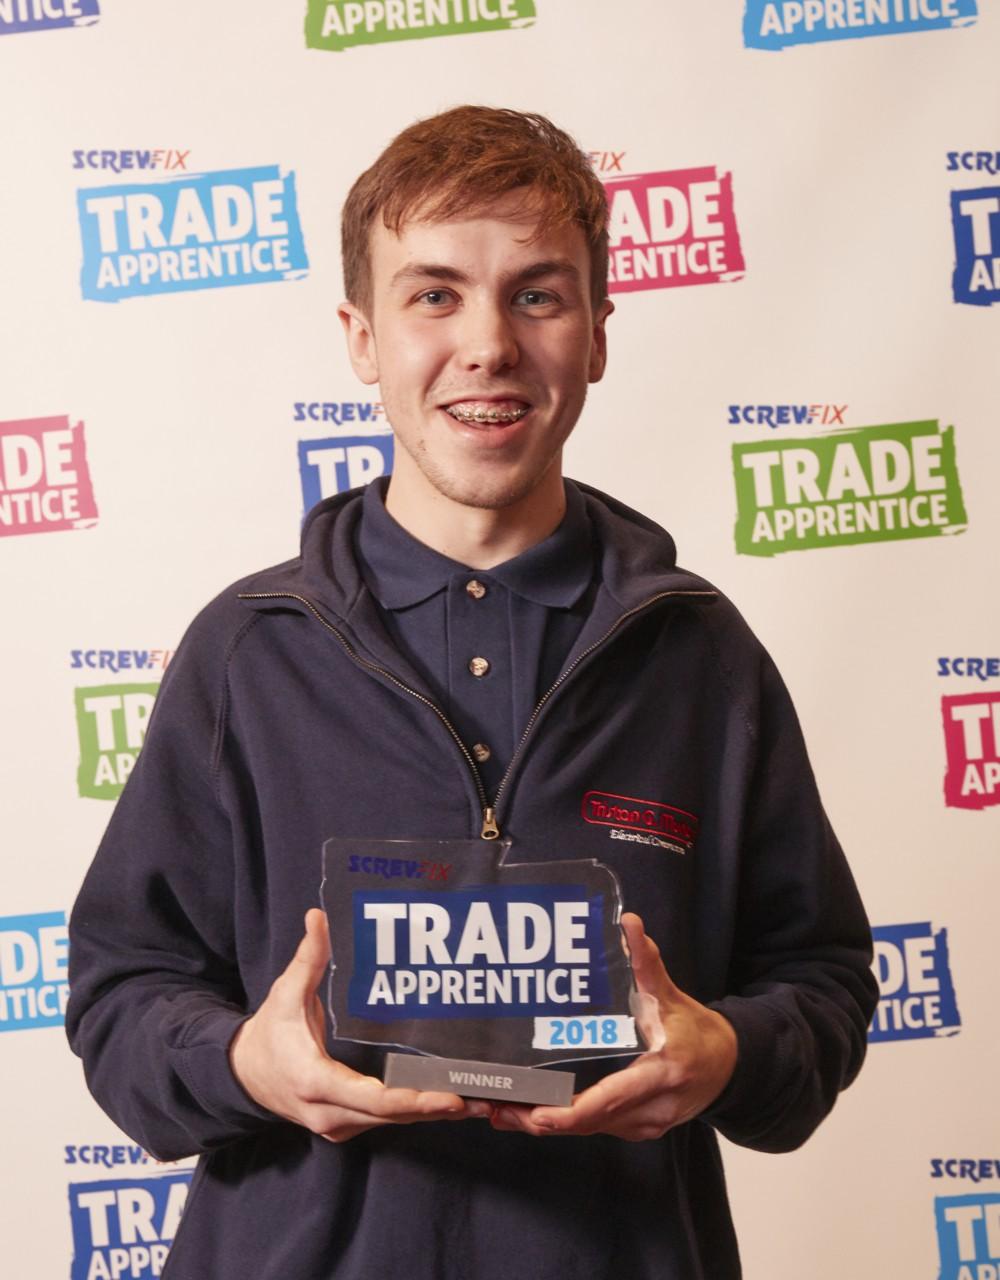 Jack Martin Screwfix Trade Apprentice 2018